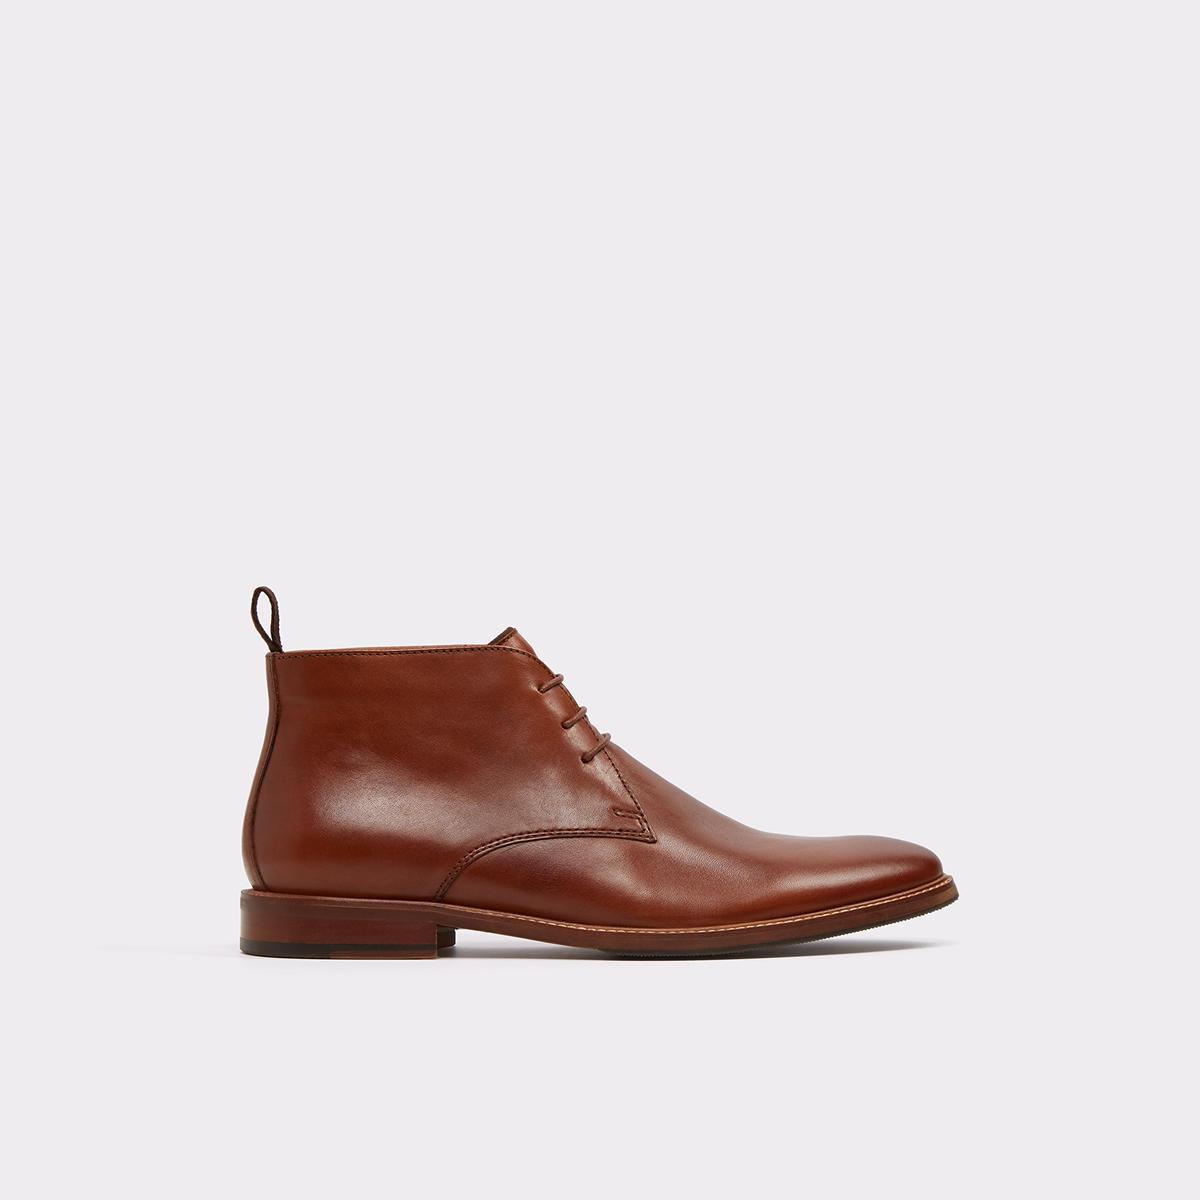 Alevia-R Cognac Men's Dress boots | ALDO US at Aldo Shoes in Victor, NY | Tuggl